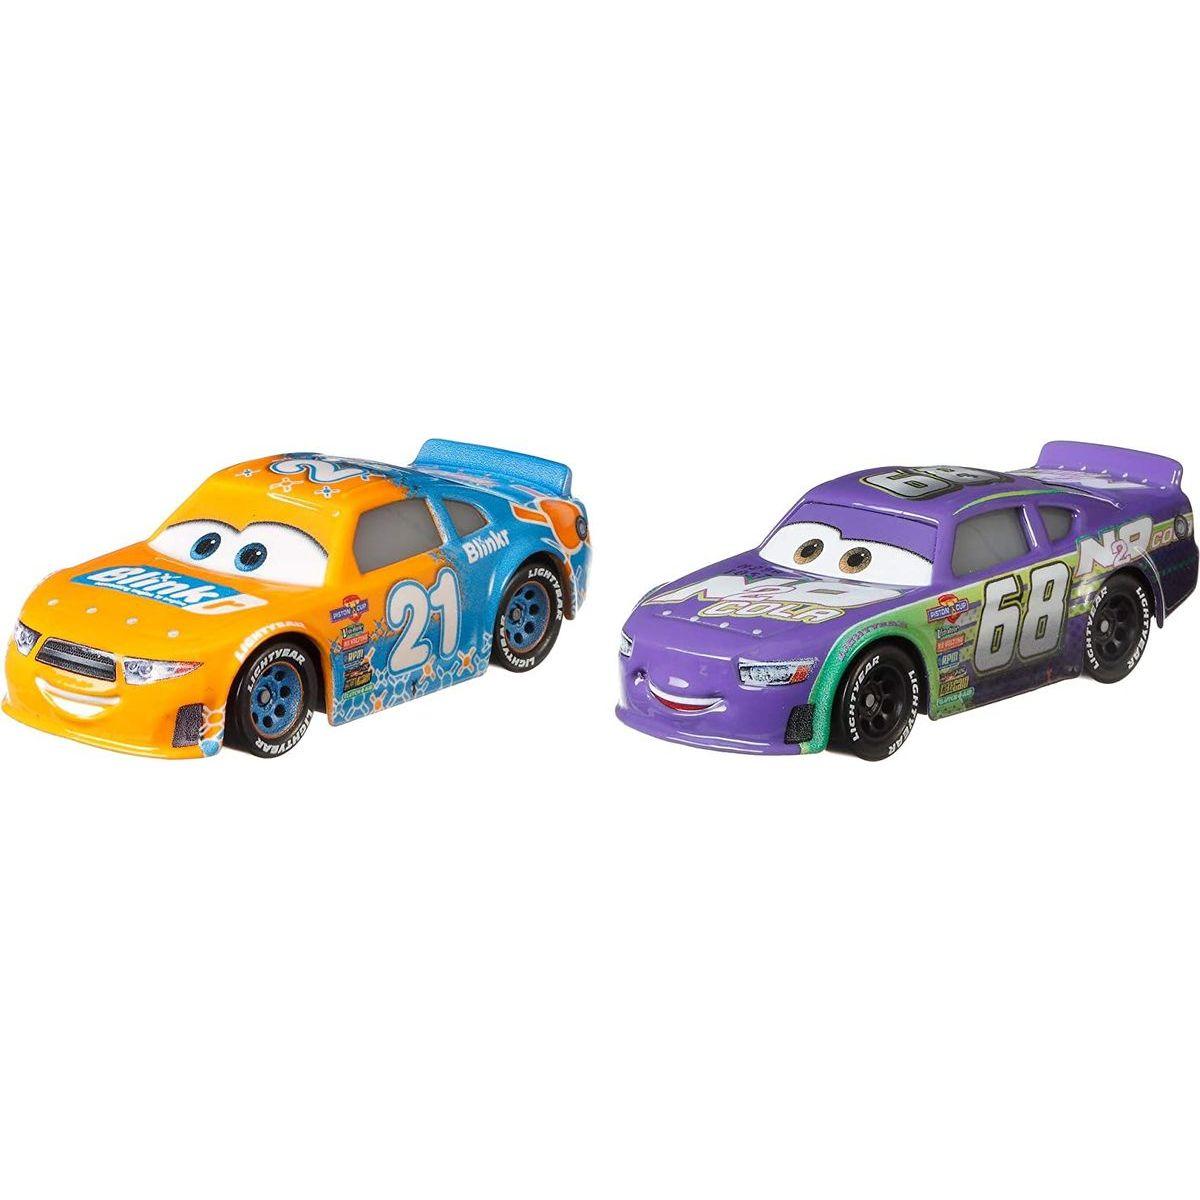 Mattel Cars 3 autá 2 ks Speedy Comet a Parker Brakeston